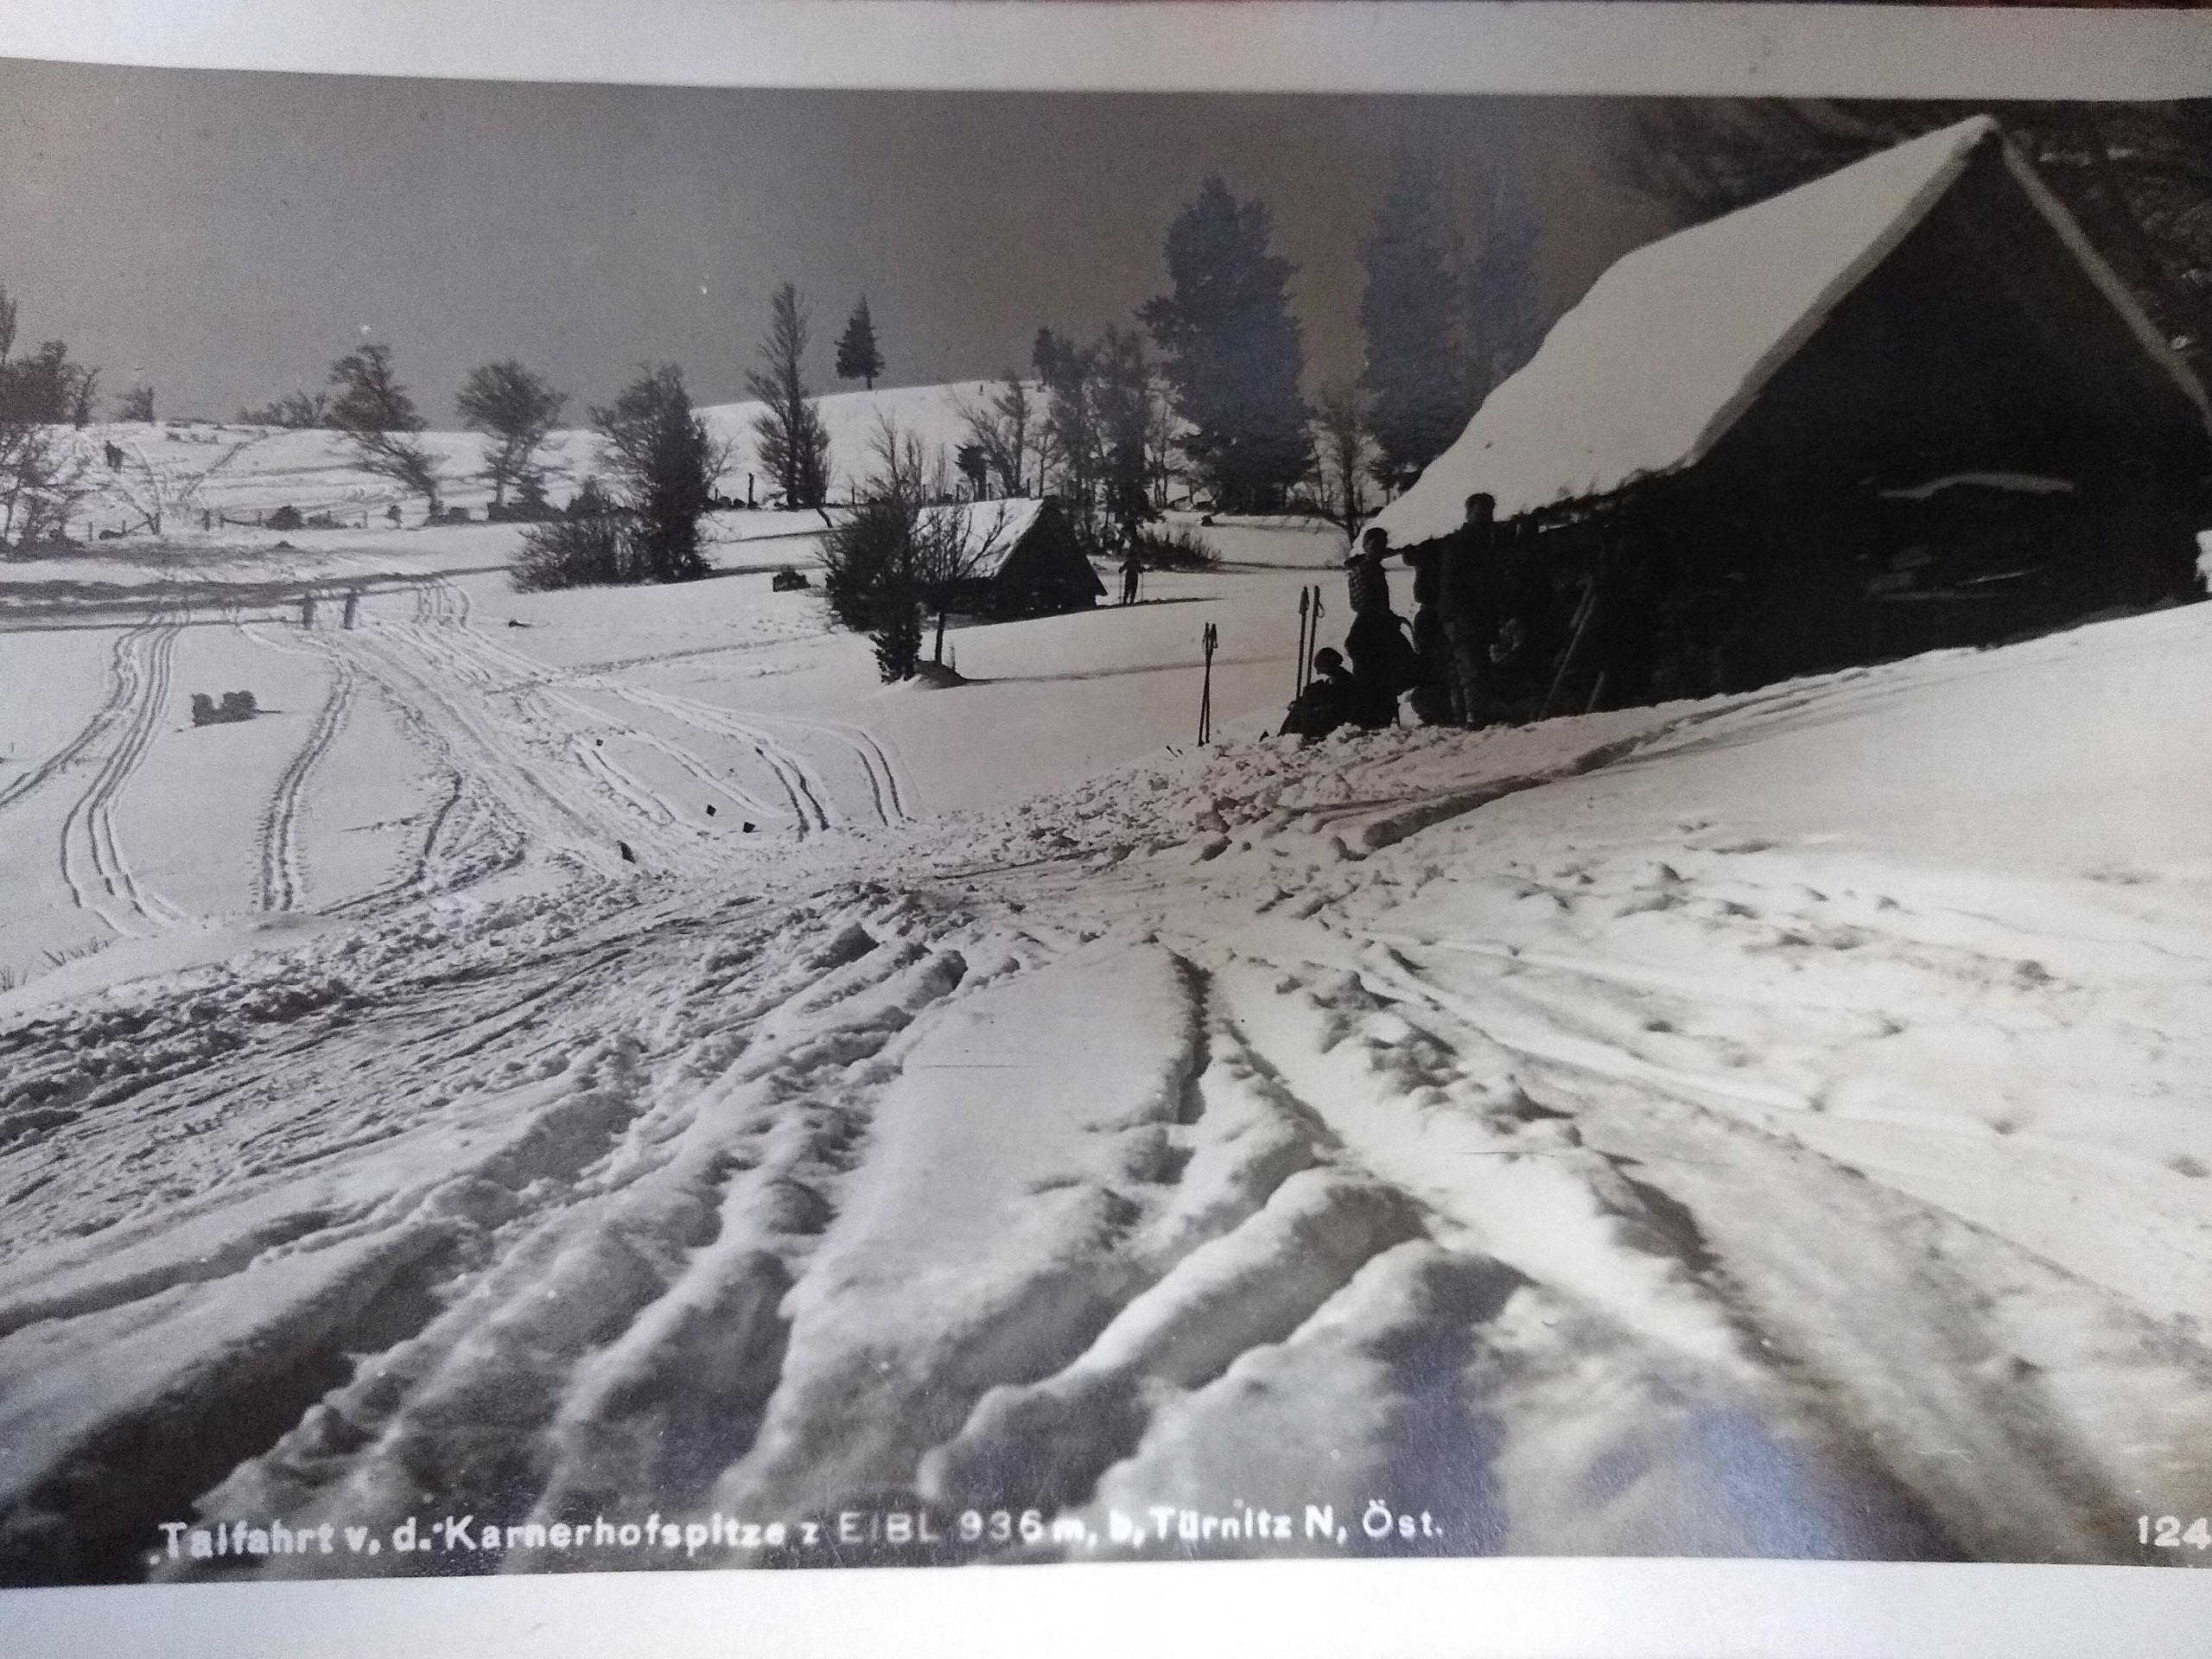 Rakúska pohľadnica Eibl Alpes Turnitz